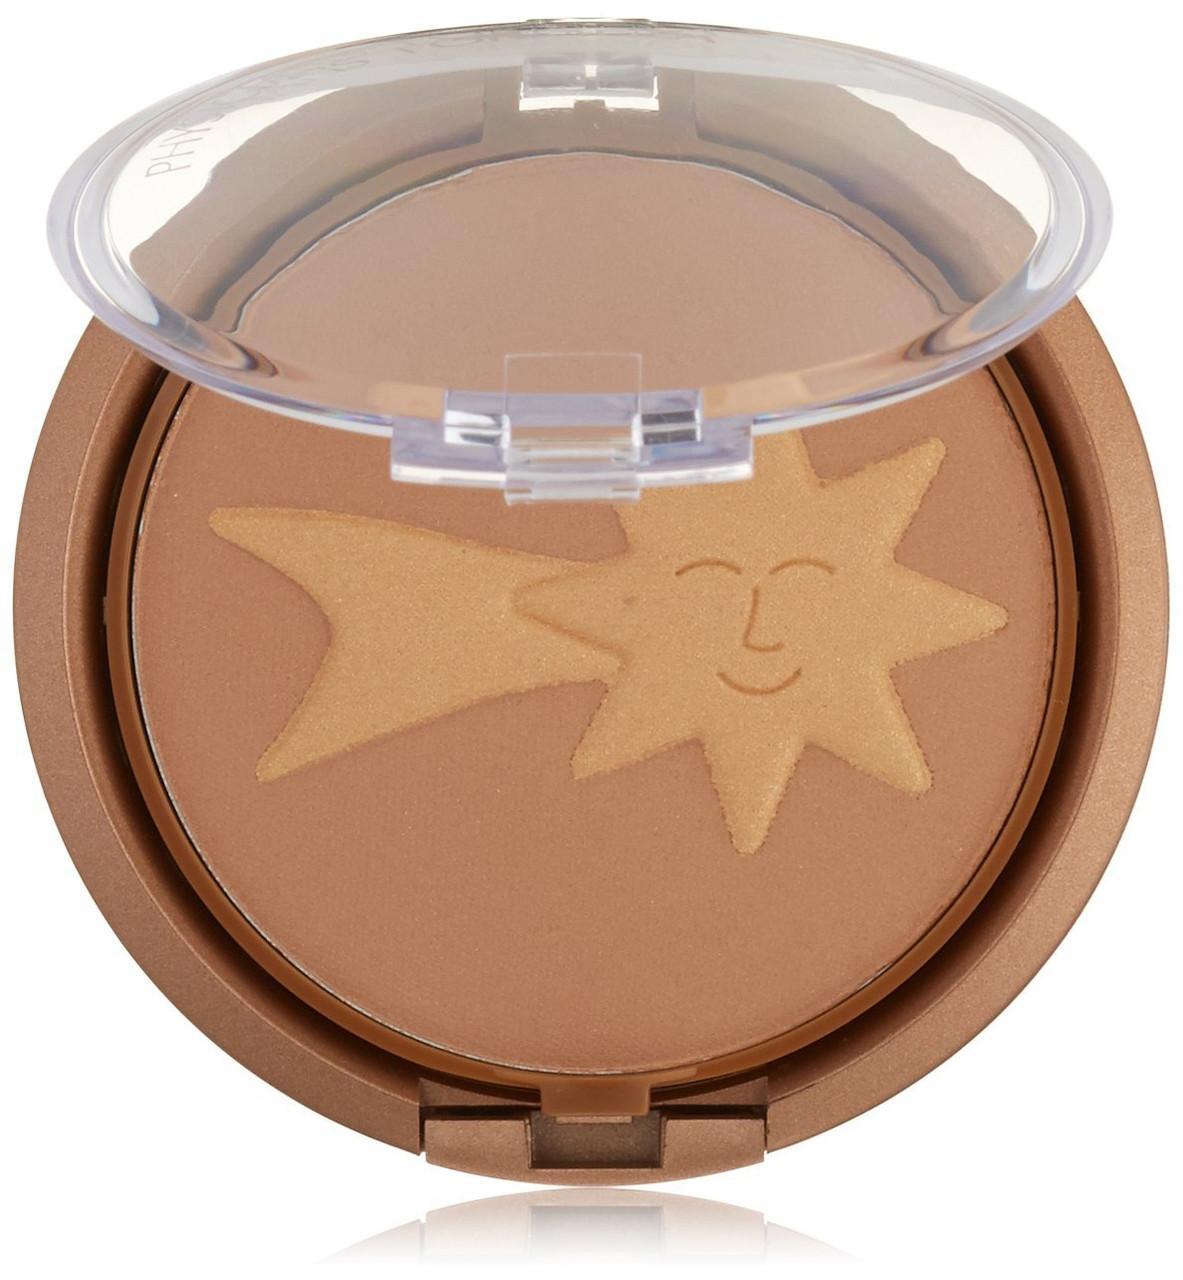 Бронзер для лица  Physicians Formula Summer Eclipse Bronzing Powder, Starlight/Medium Bronzer